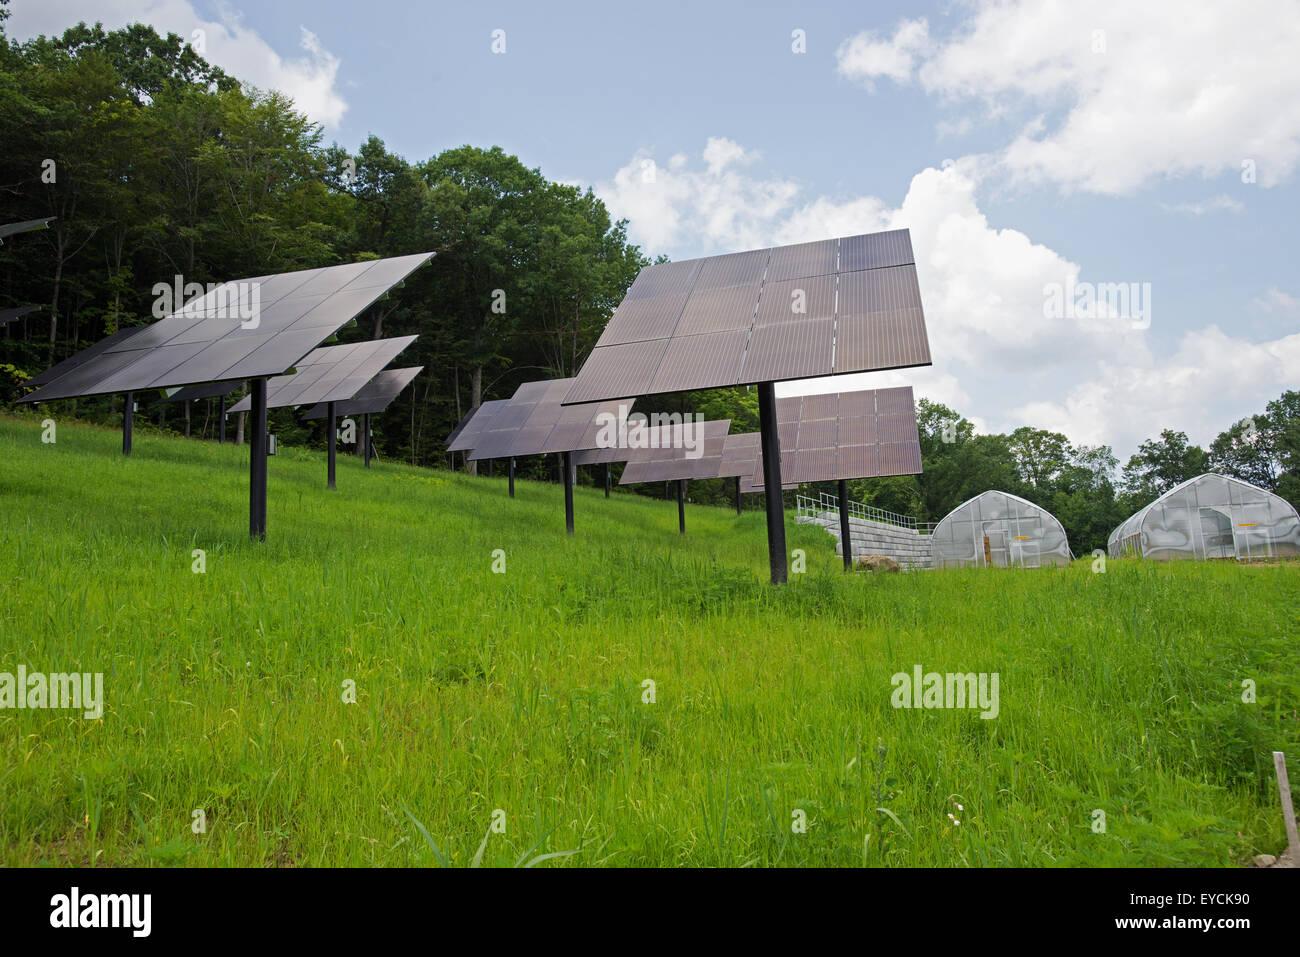 Solar power panels in Kensington Food Barn New Hampshire USA - Stock Image